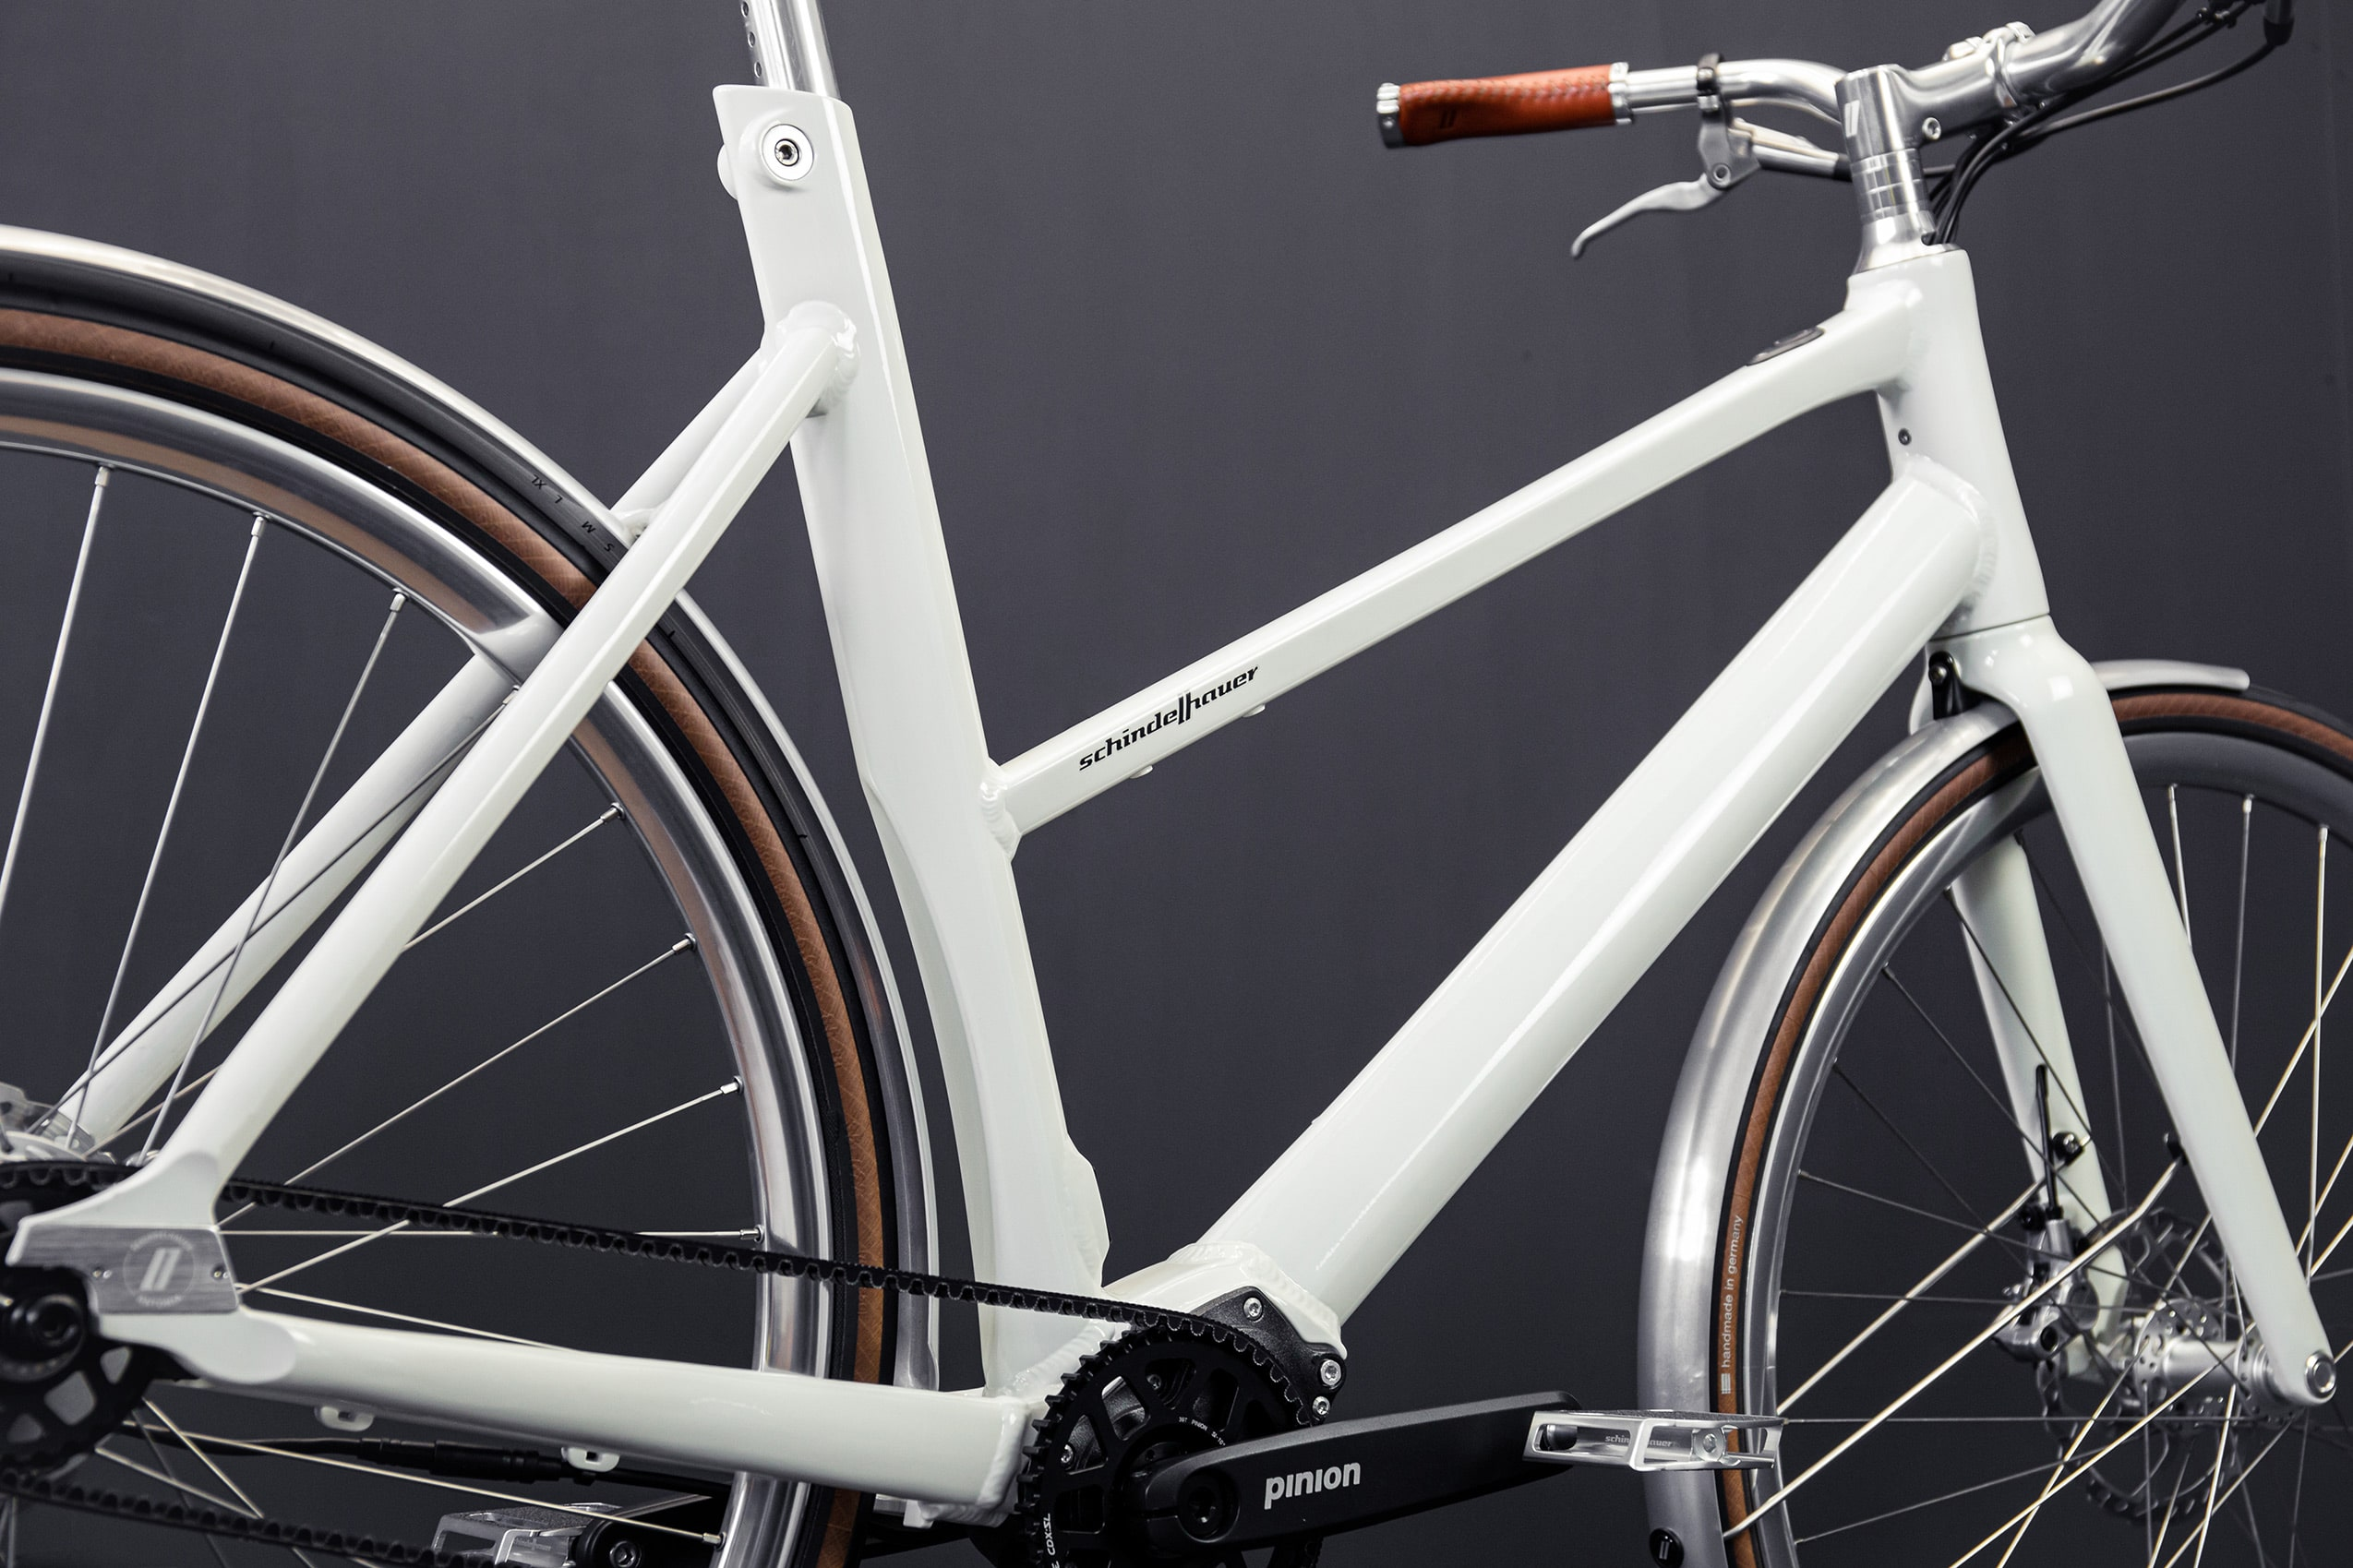 schindelhauer Antonia Pinion e-bike -15